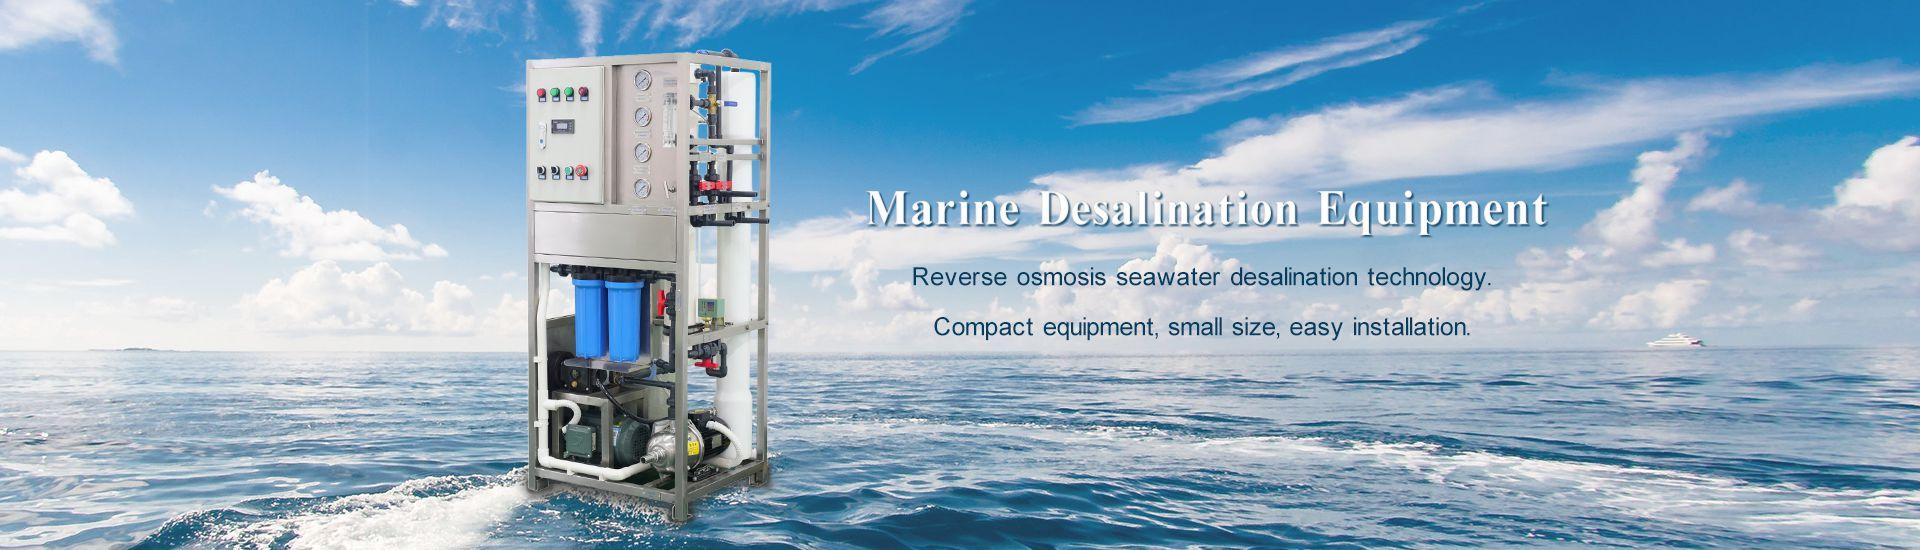 Marine Desalination Equipment